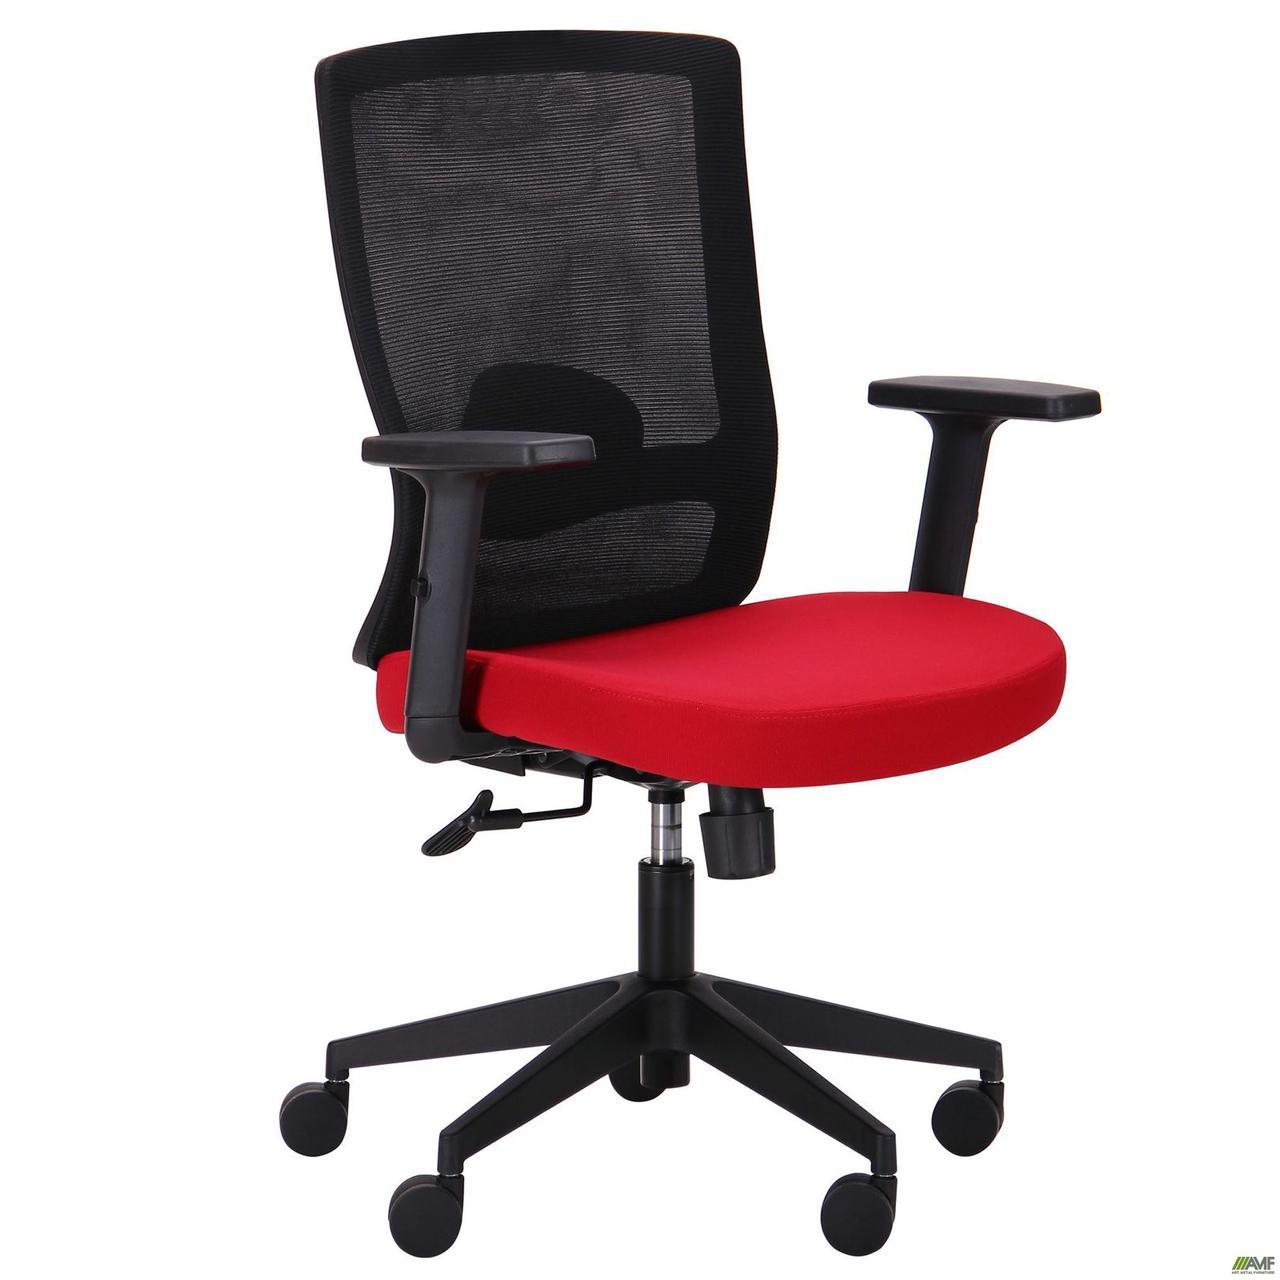 Кресло Xenon LB черный/гранат TM AMF